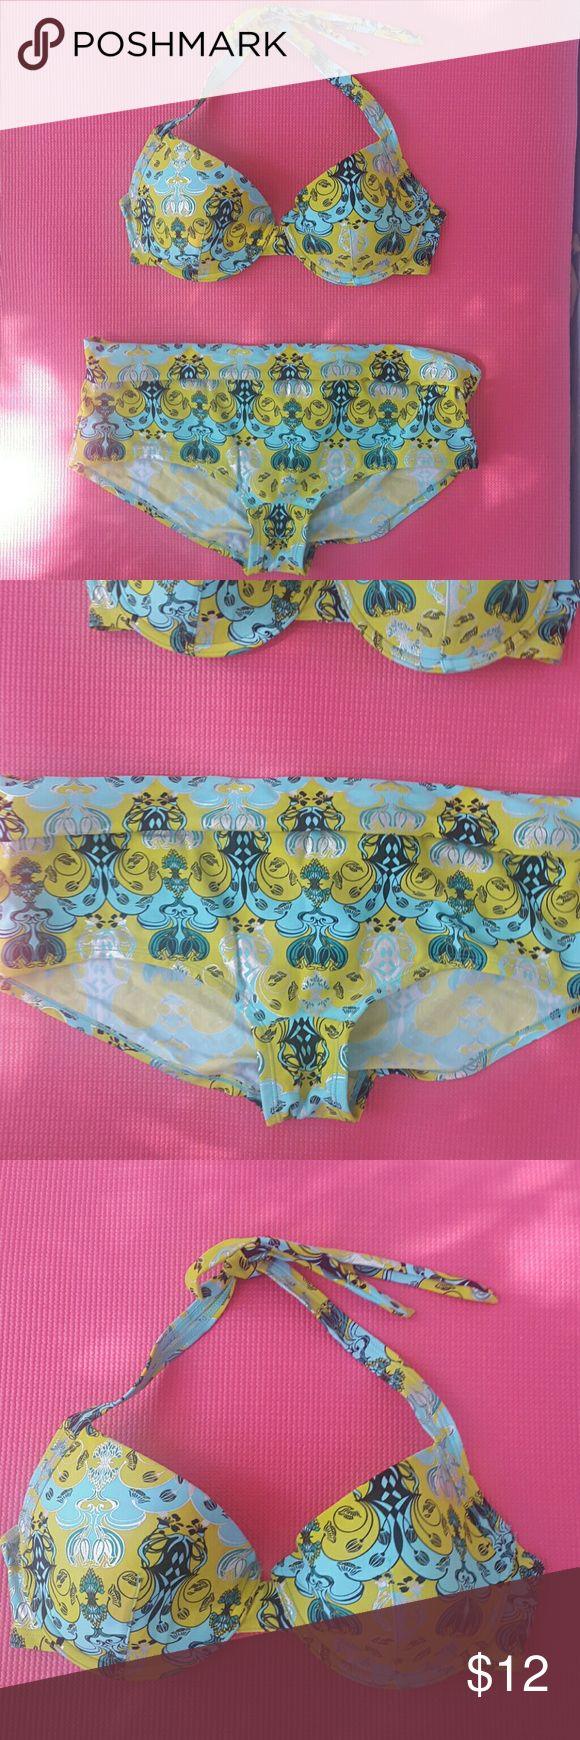 NWOT Green/ turquoise bikini Never worn, received as a gift, too large. Bra UK 75D. Bottom UK 44 lindex Swim Bikinis